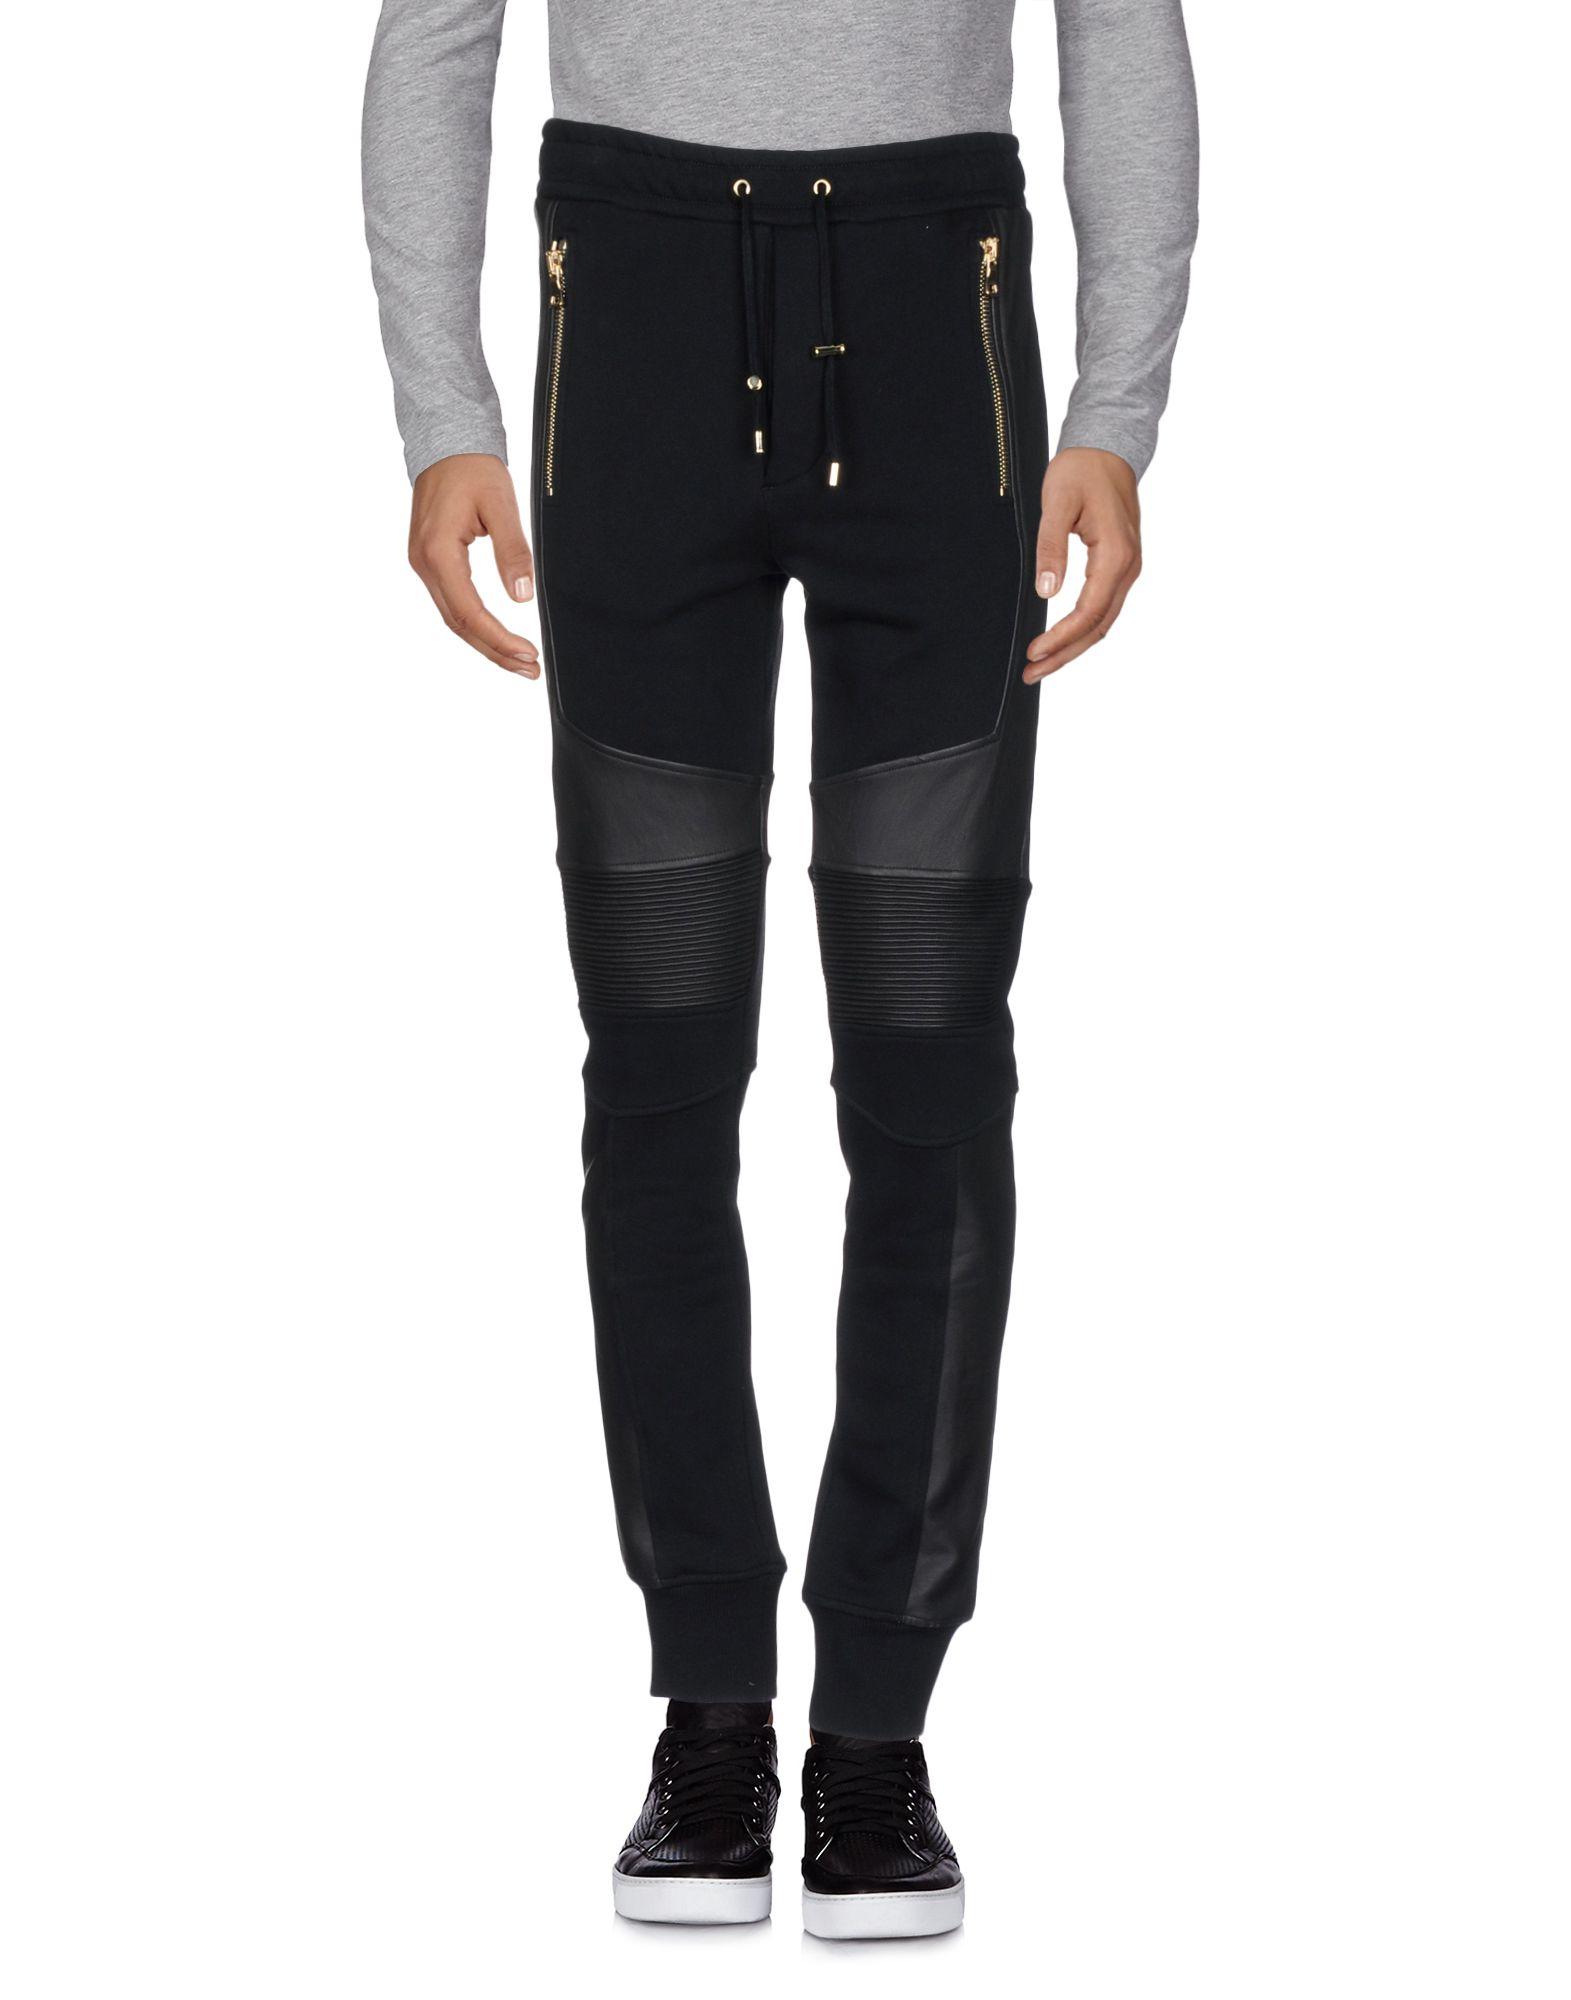 Pantalone Balmain Donna - Acquista online su